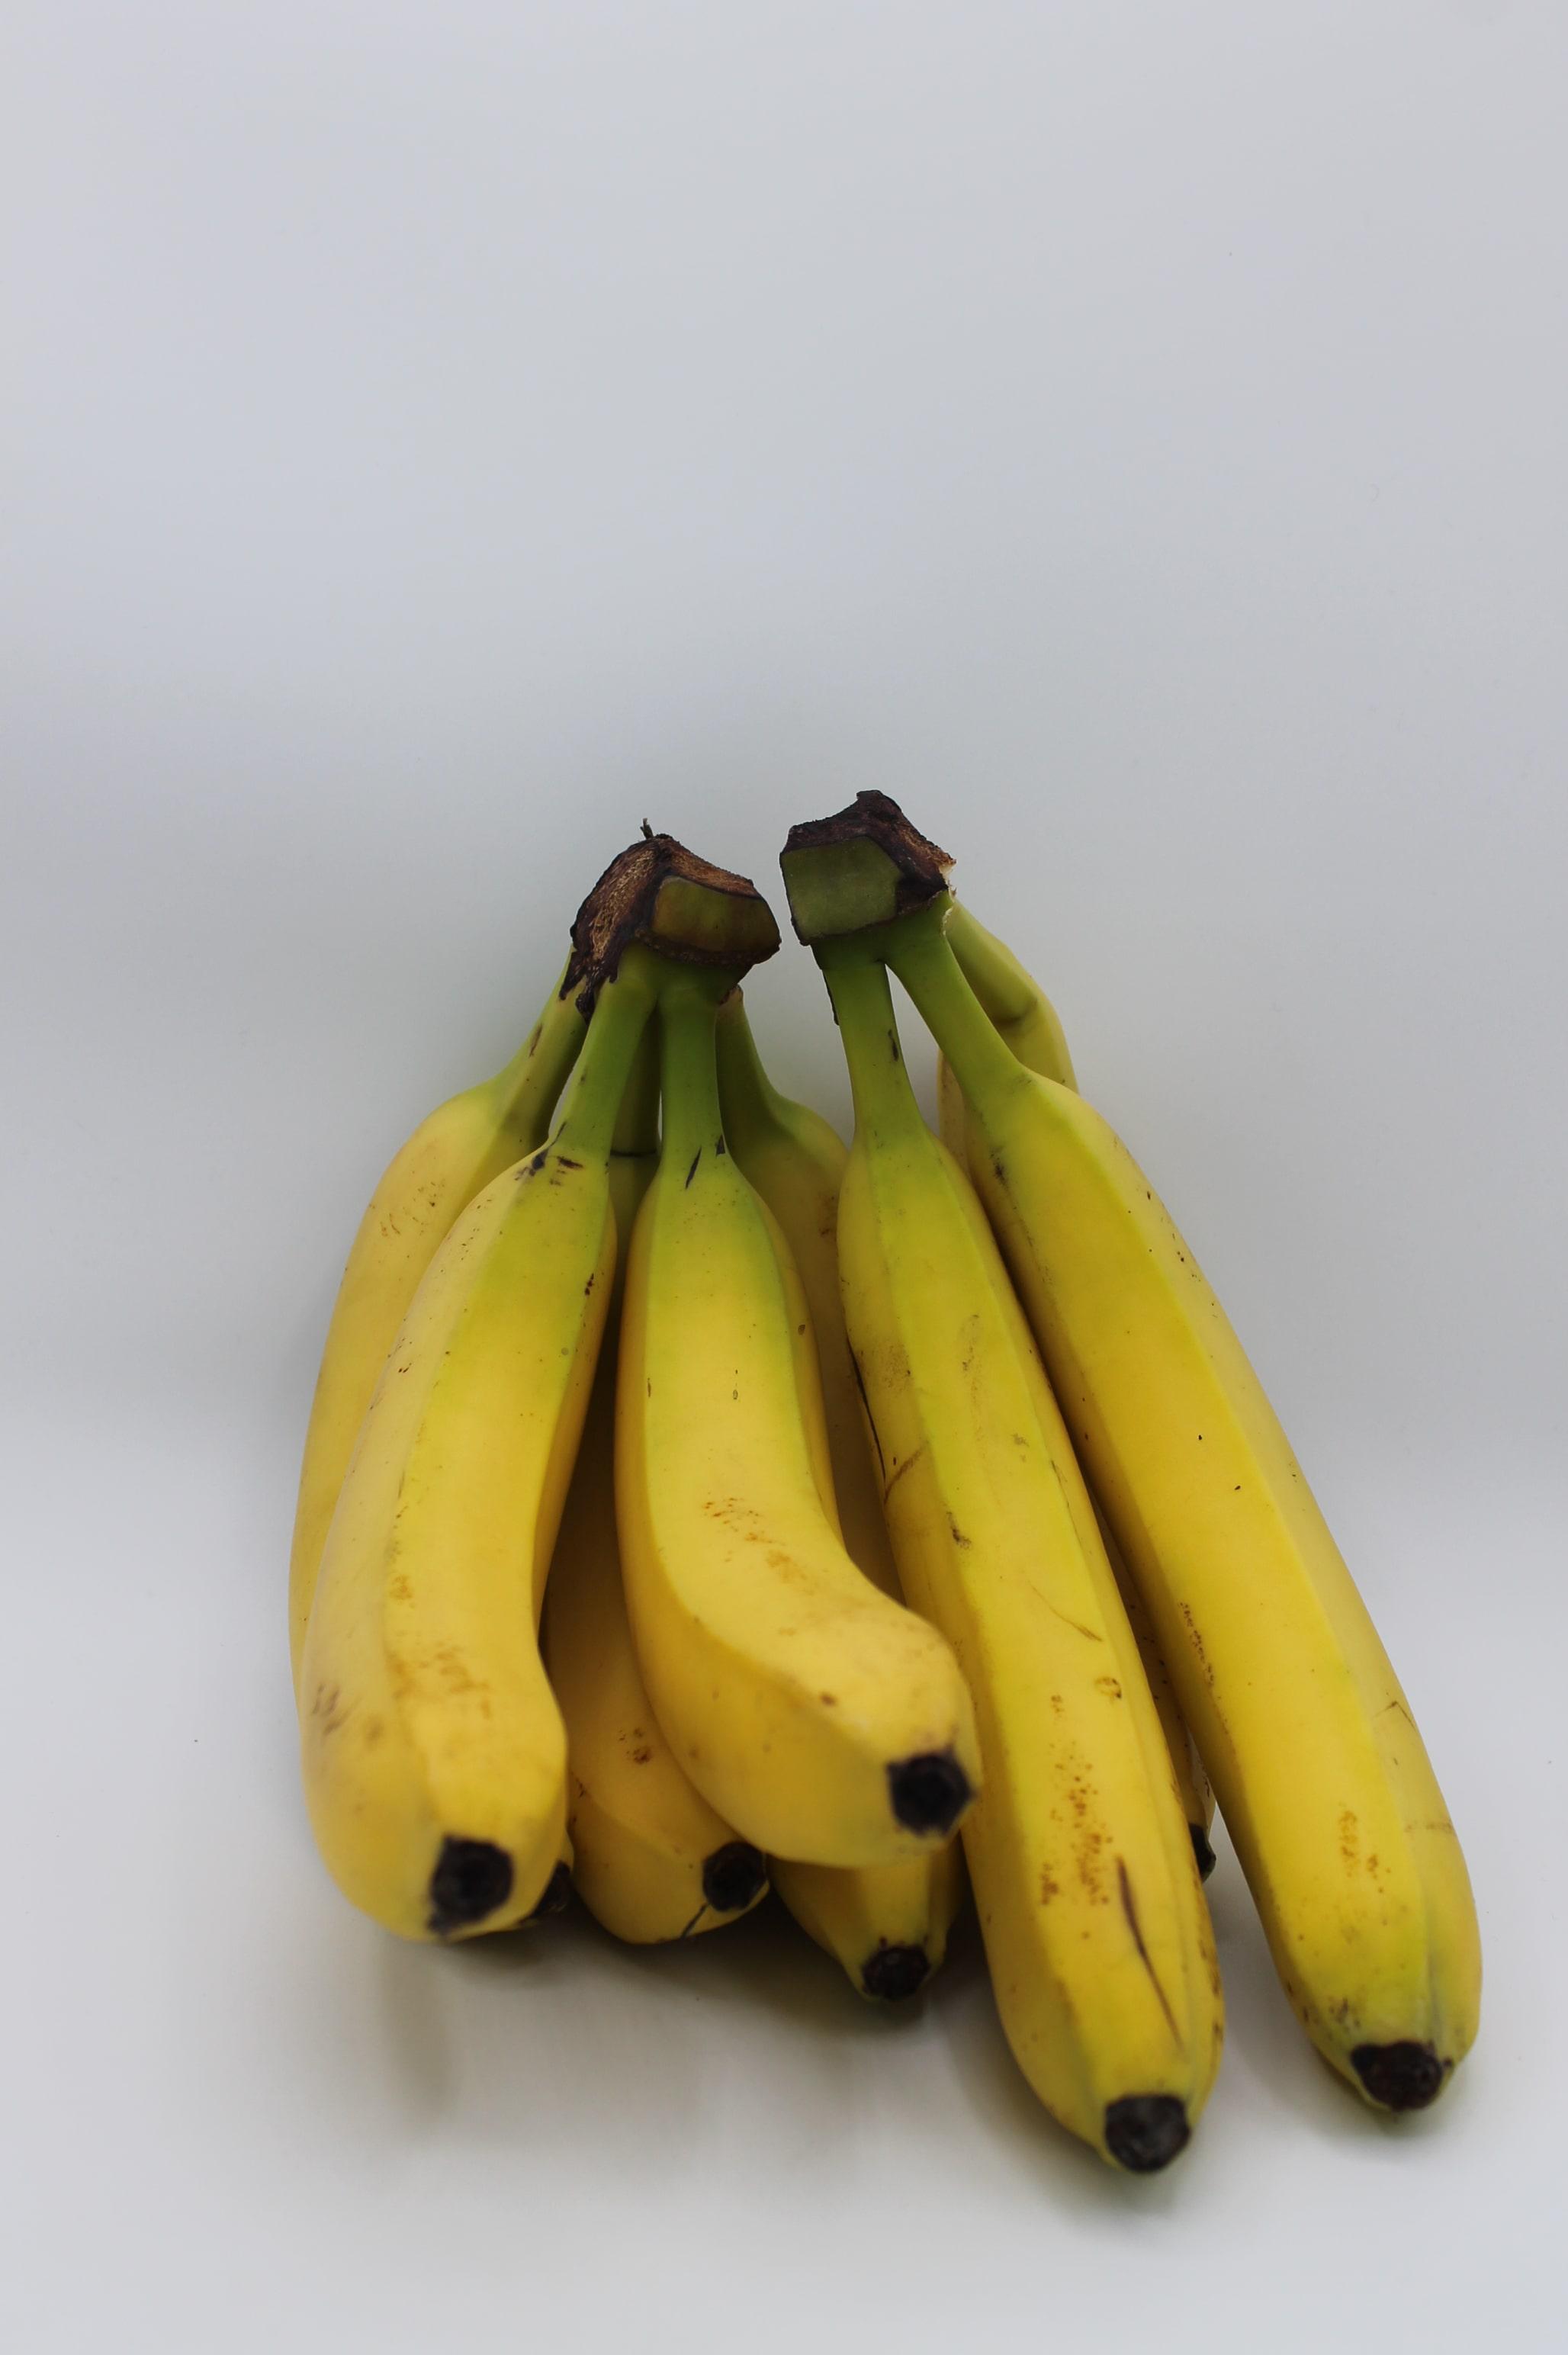 Banane coop produzione Ecuador.